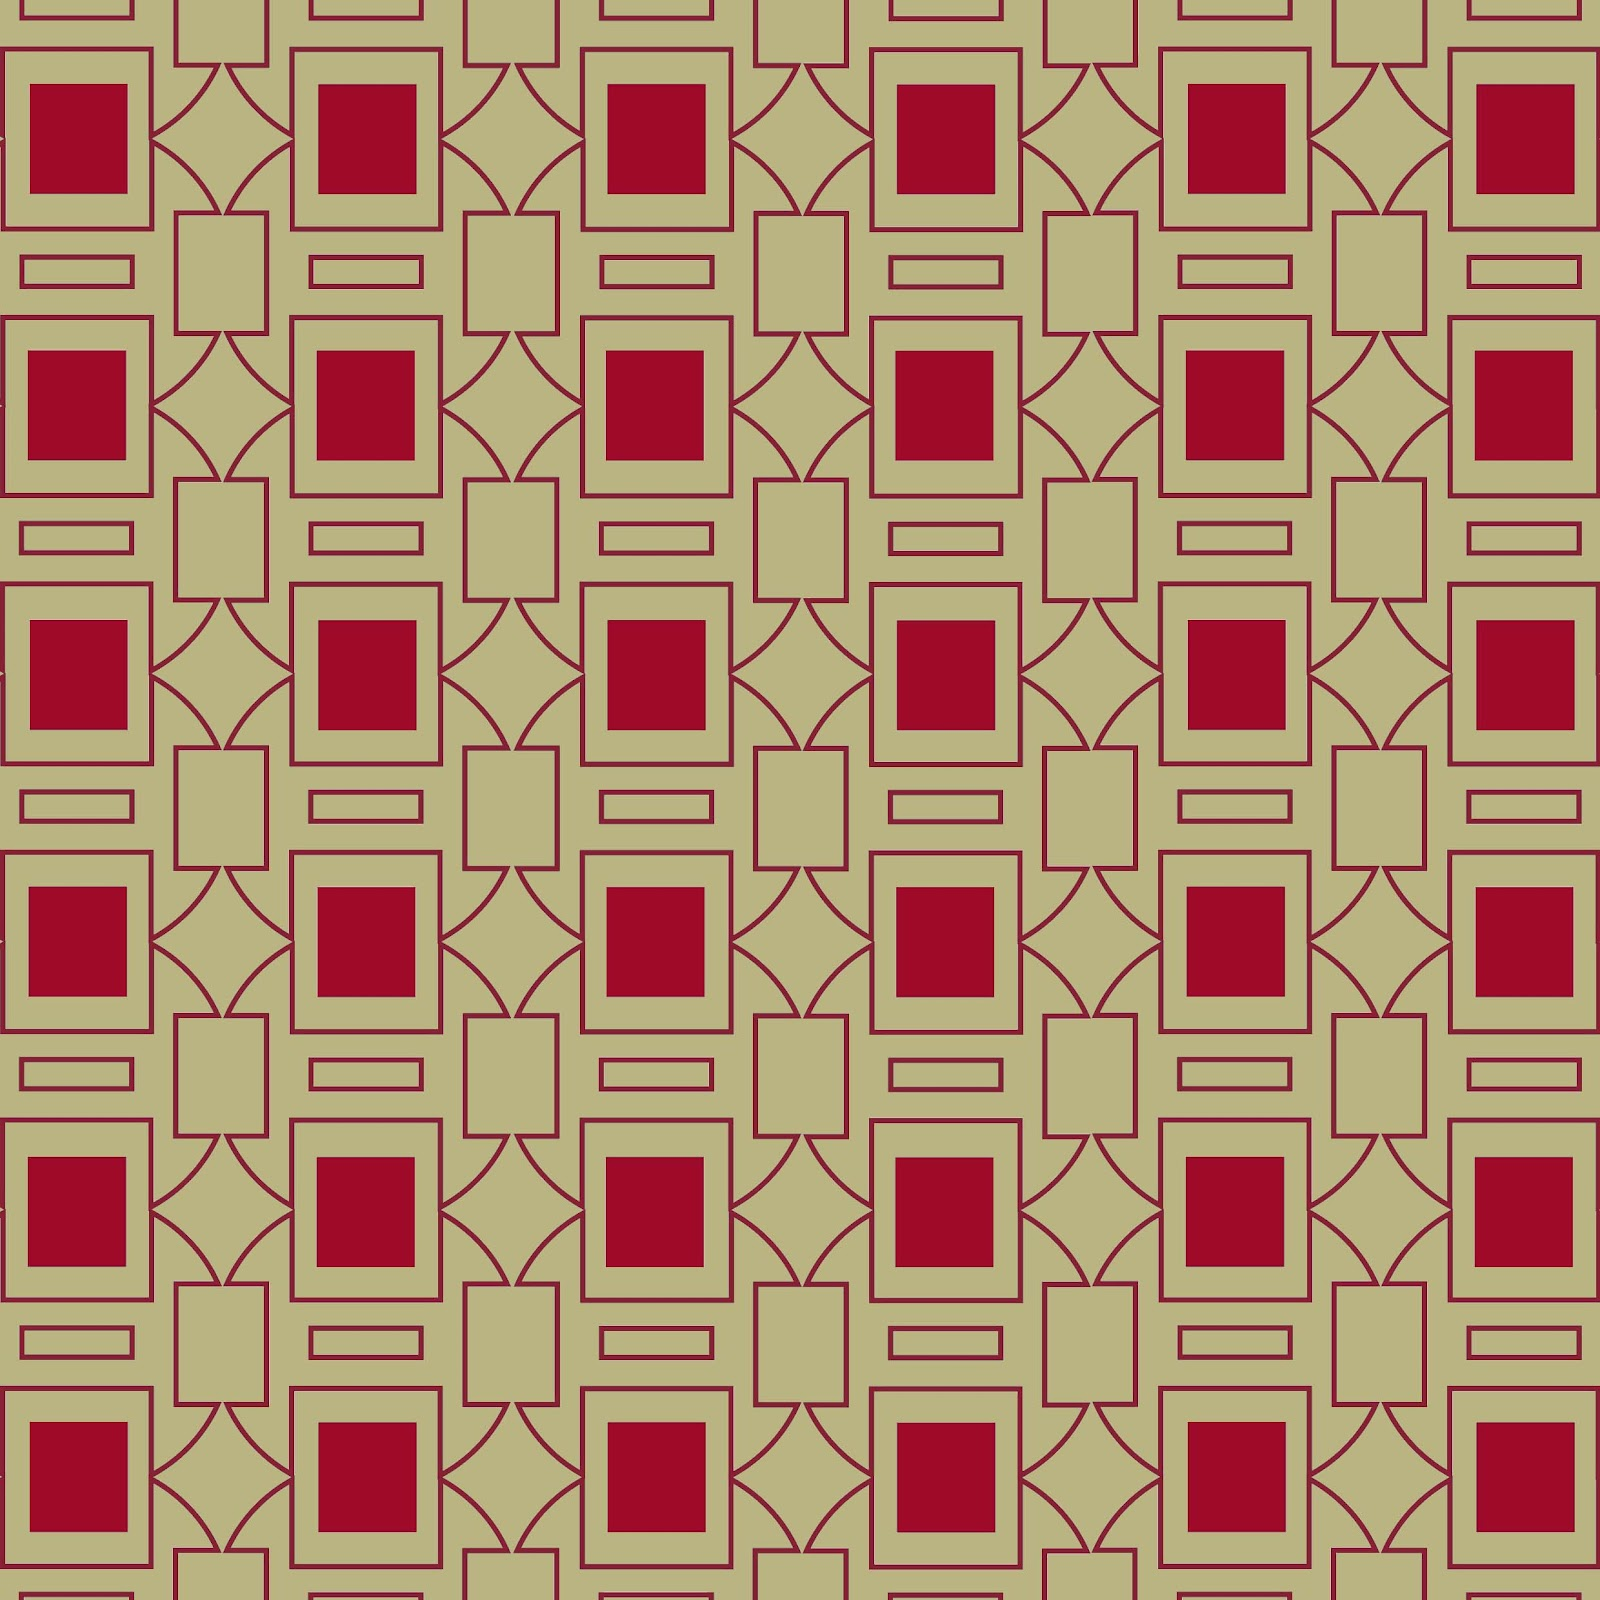 simple geometric design - photo #46